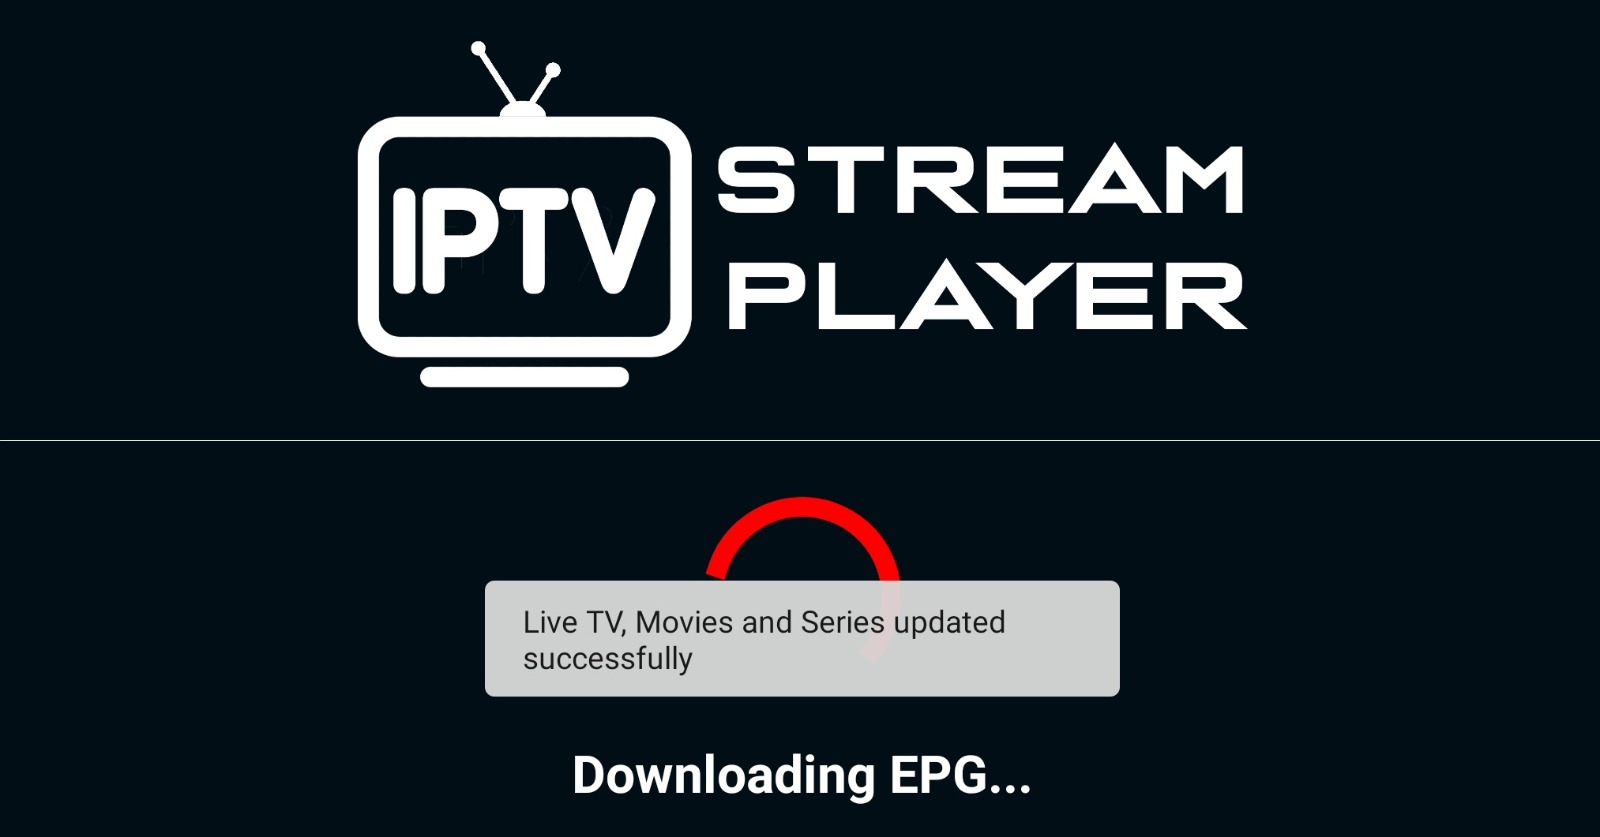 iptvstreamplayer2